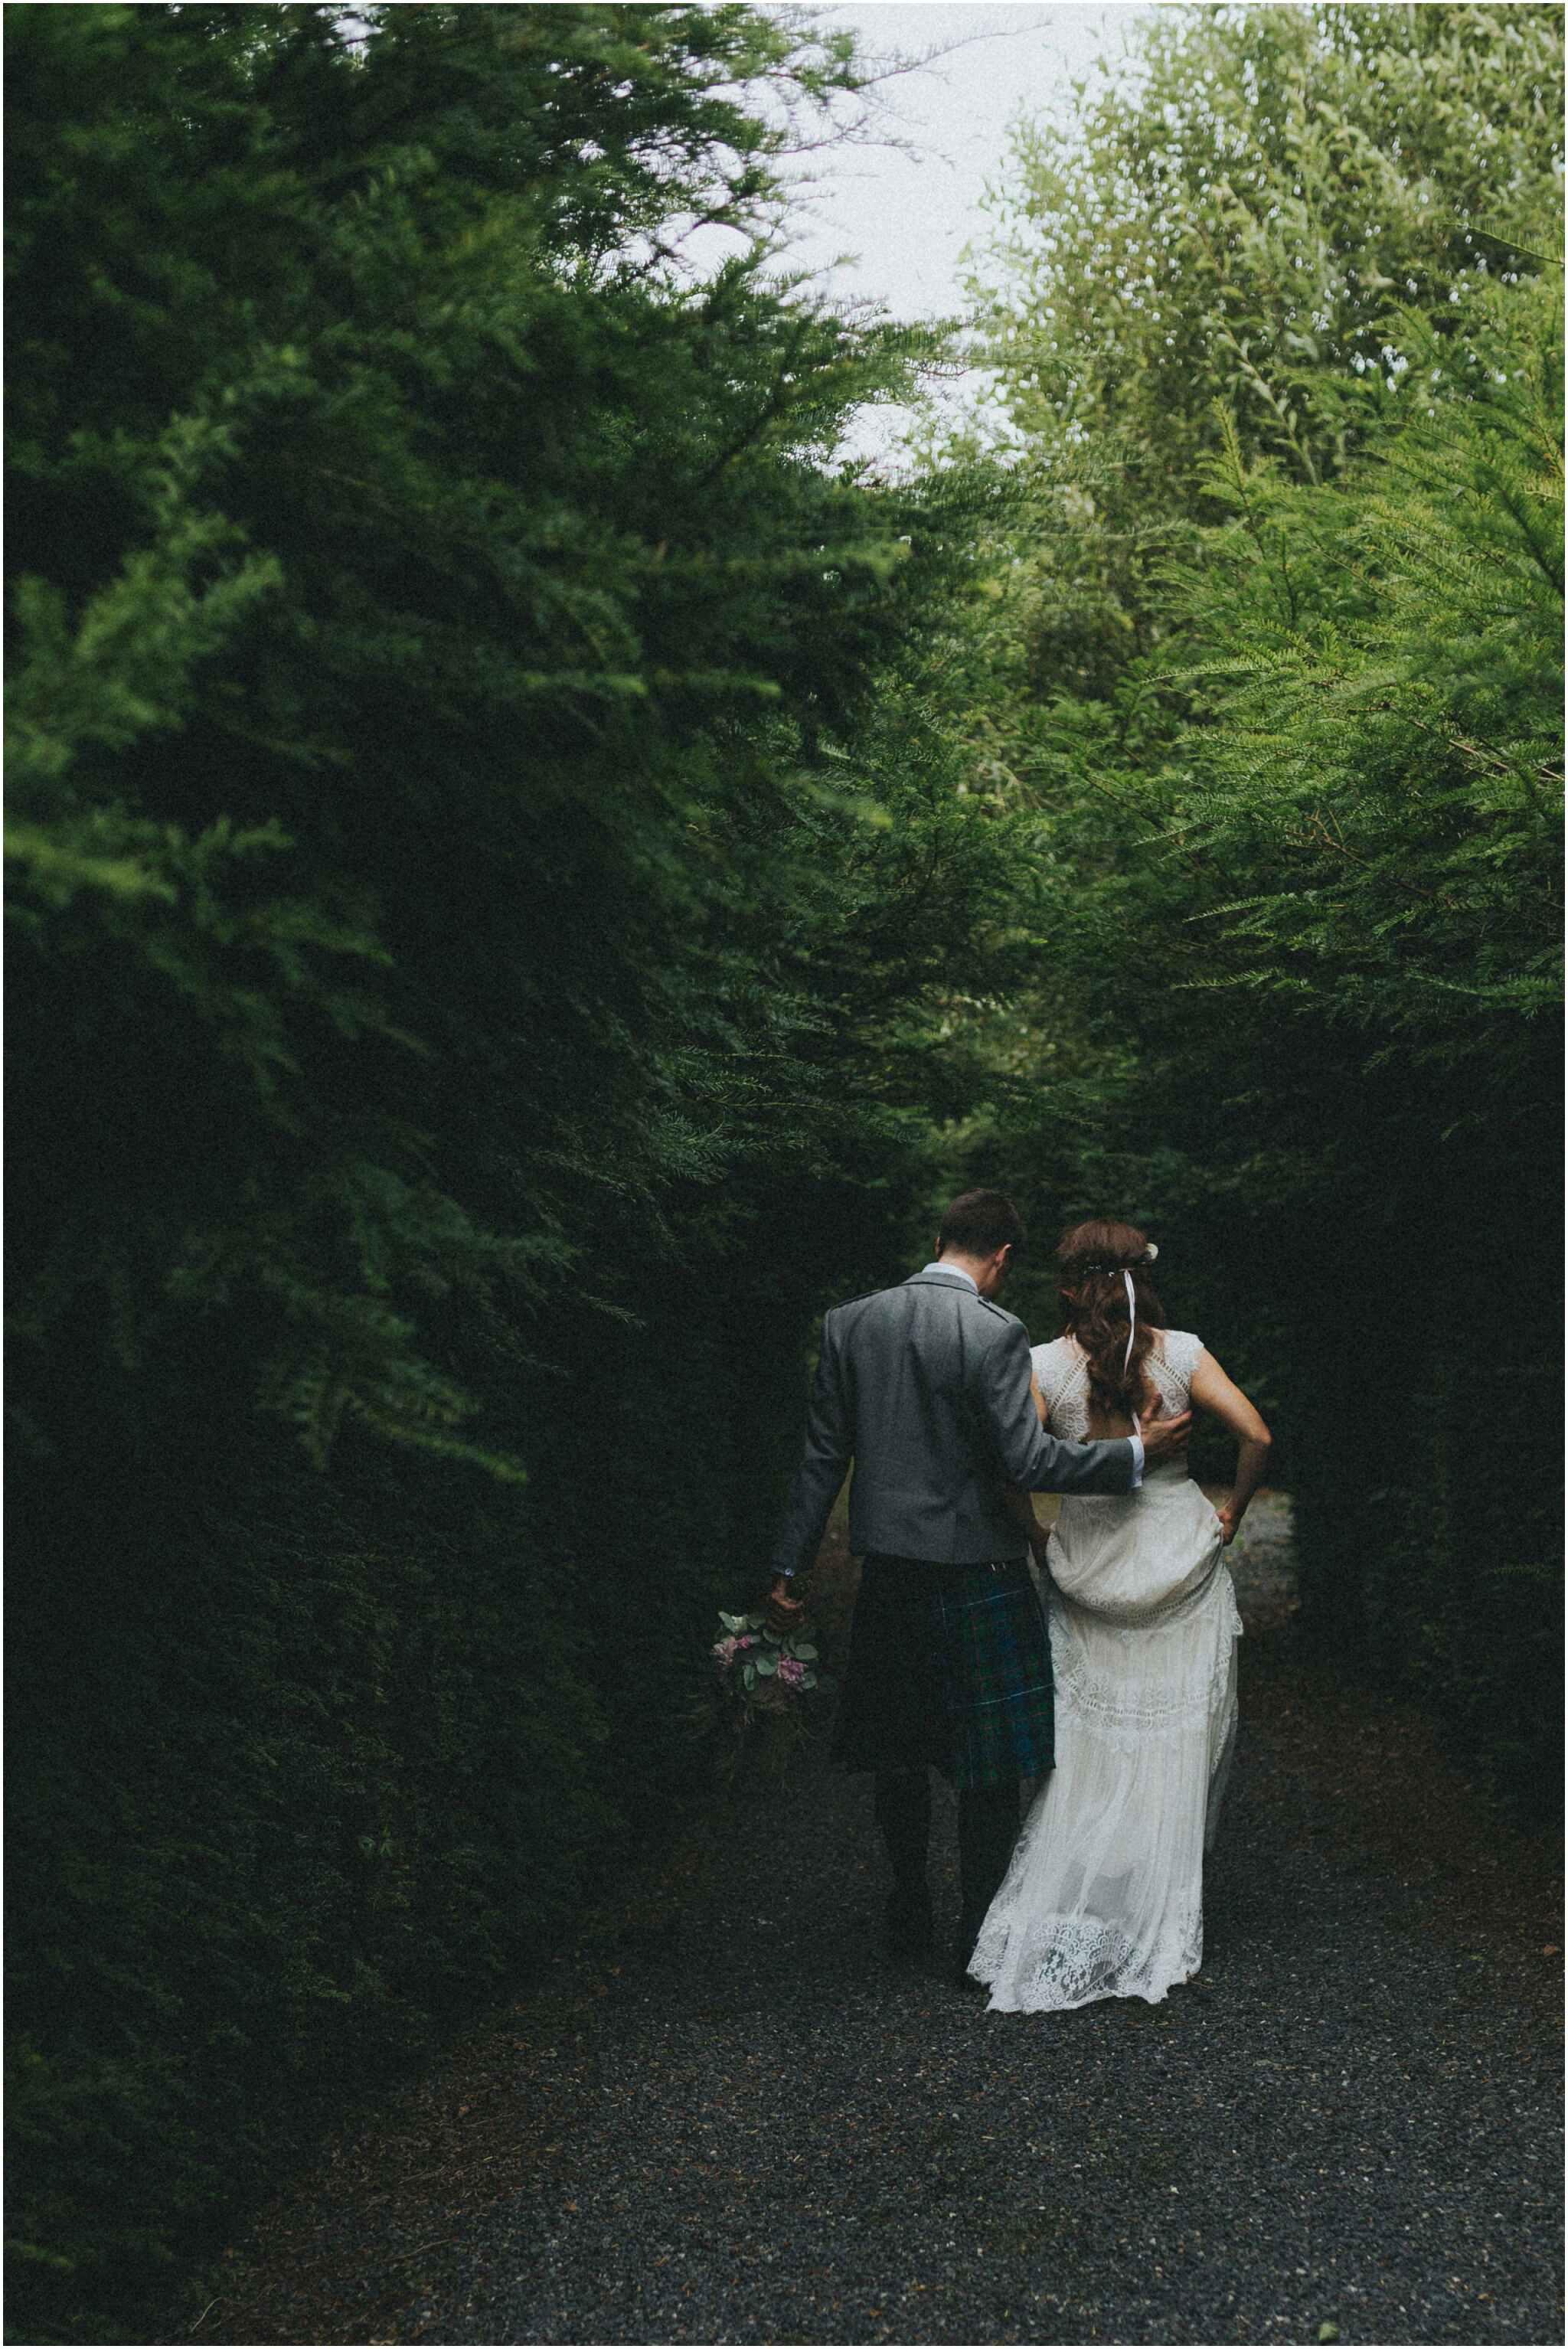 Fionnuala + Paul - Mount Druid Alternative Wedding 138